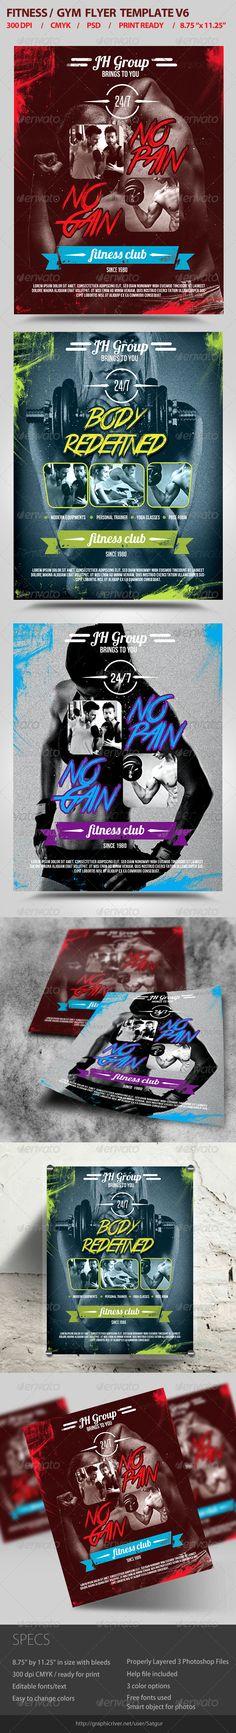 Fitness Flyer / Gym Flyer Template PSD V6 - Flyers Print Templates